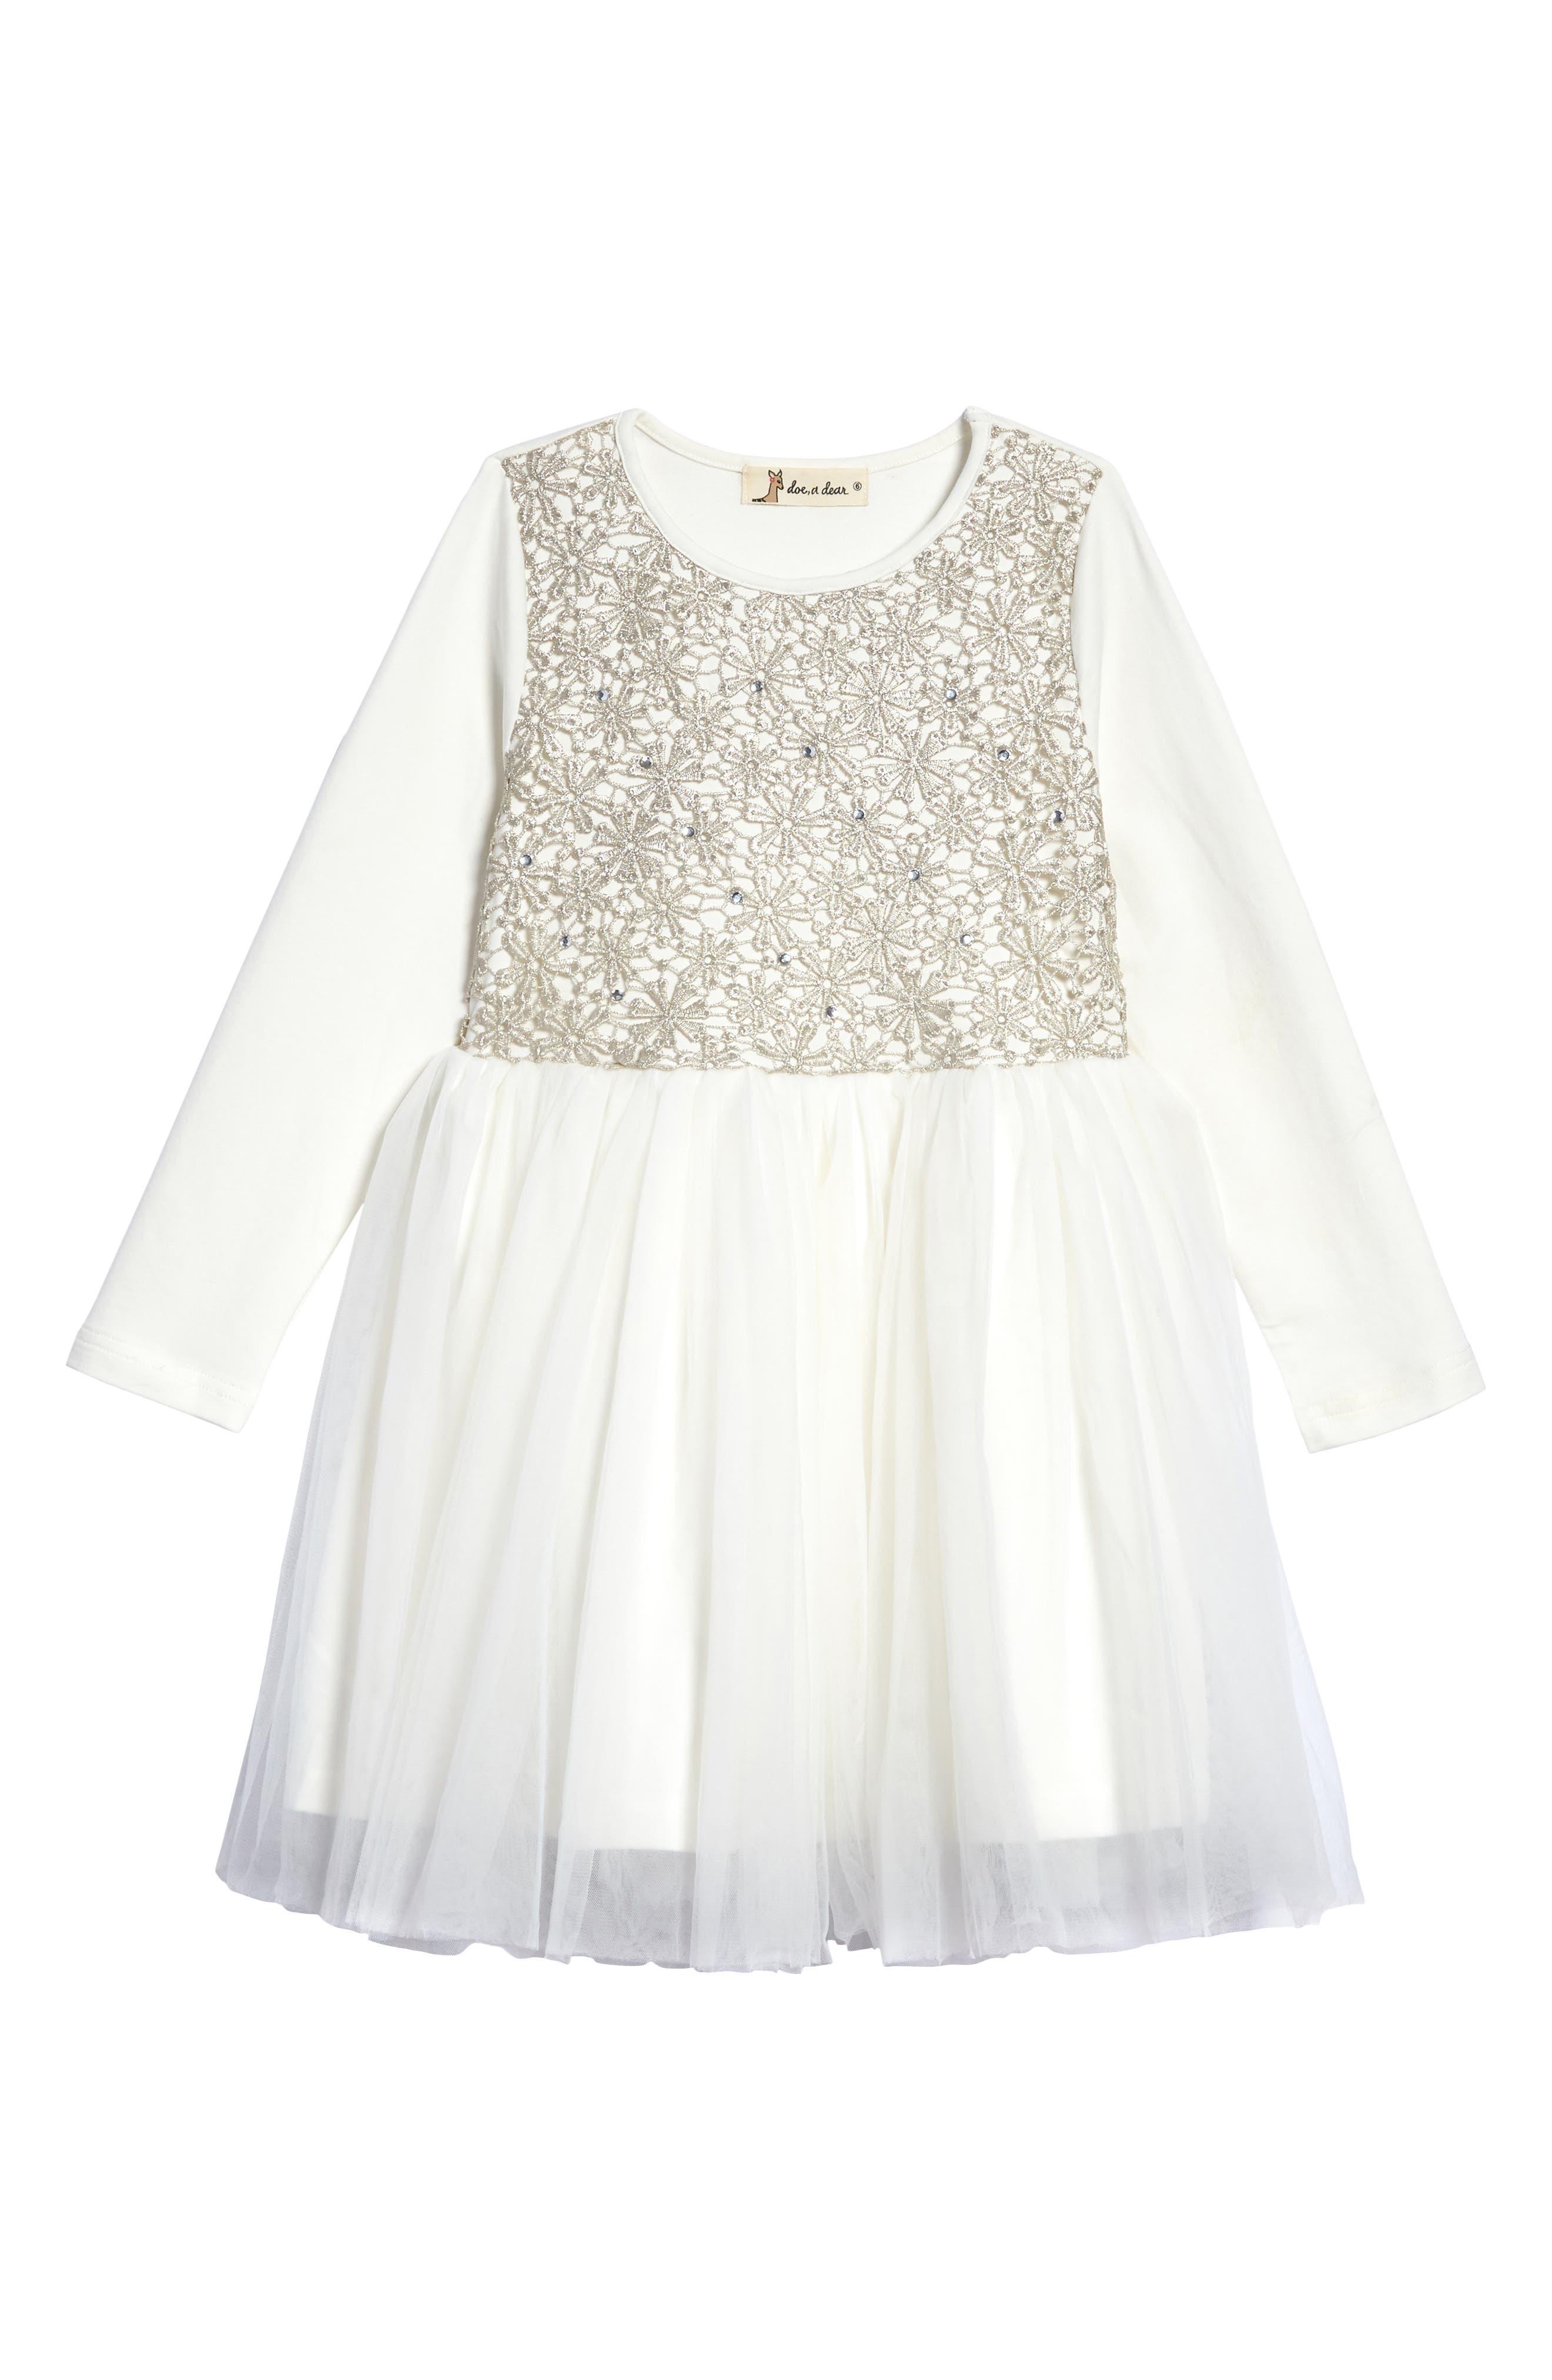 Alternate Image 1 Selected - Doe A Dear Tulle Party Dress (Toddler Girls & Little Girls)